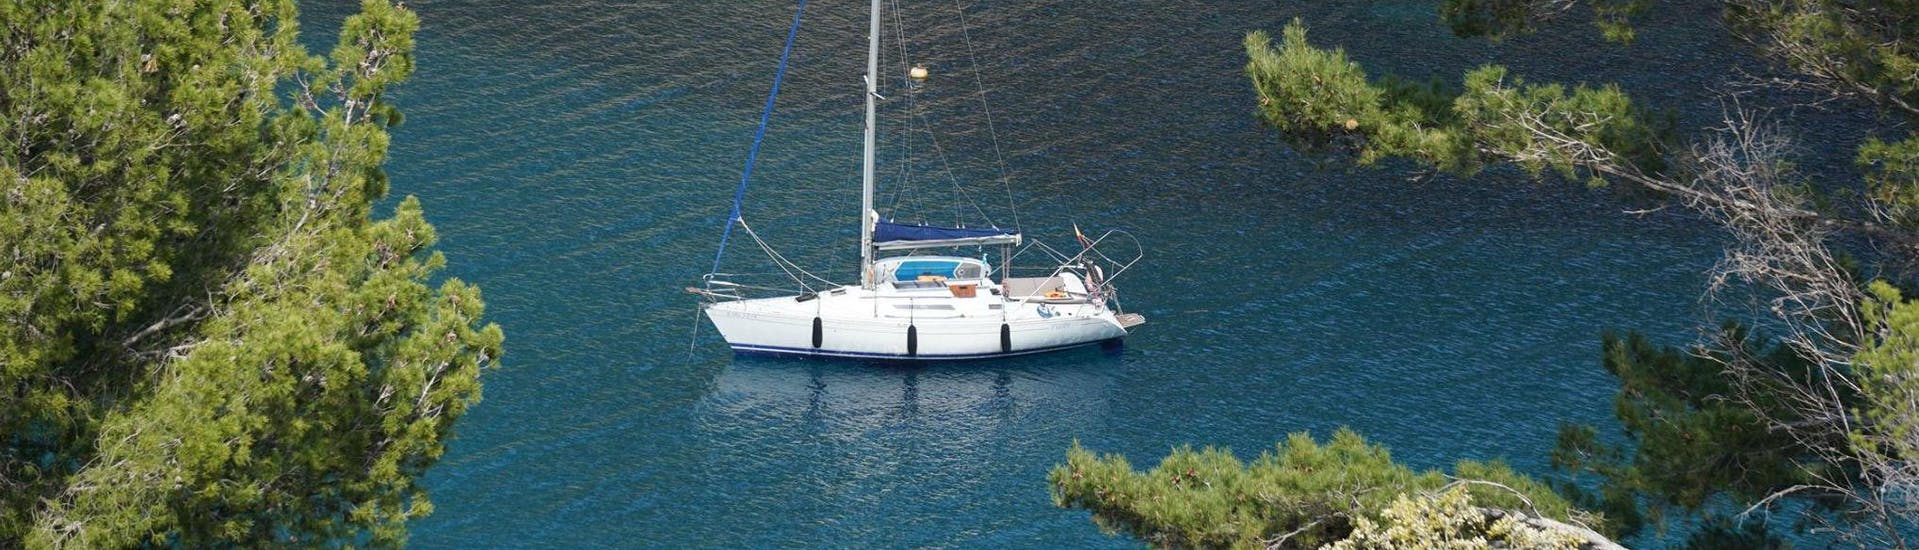 private-sailing-snorkeling-along-the-coast-spring-lets-sail-mallorca-hero